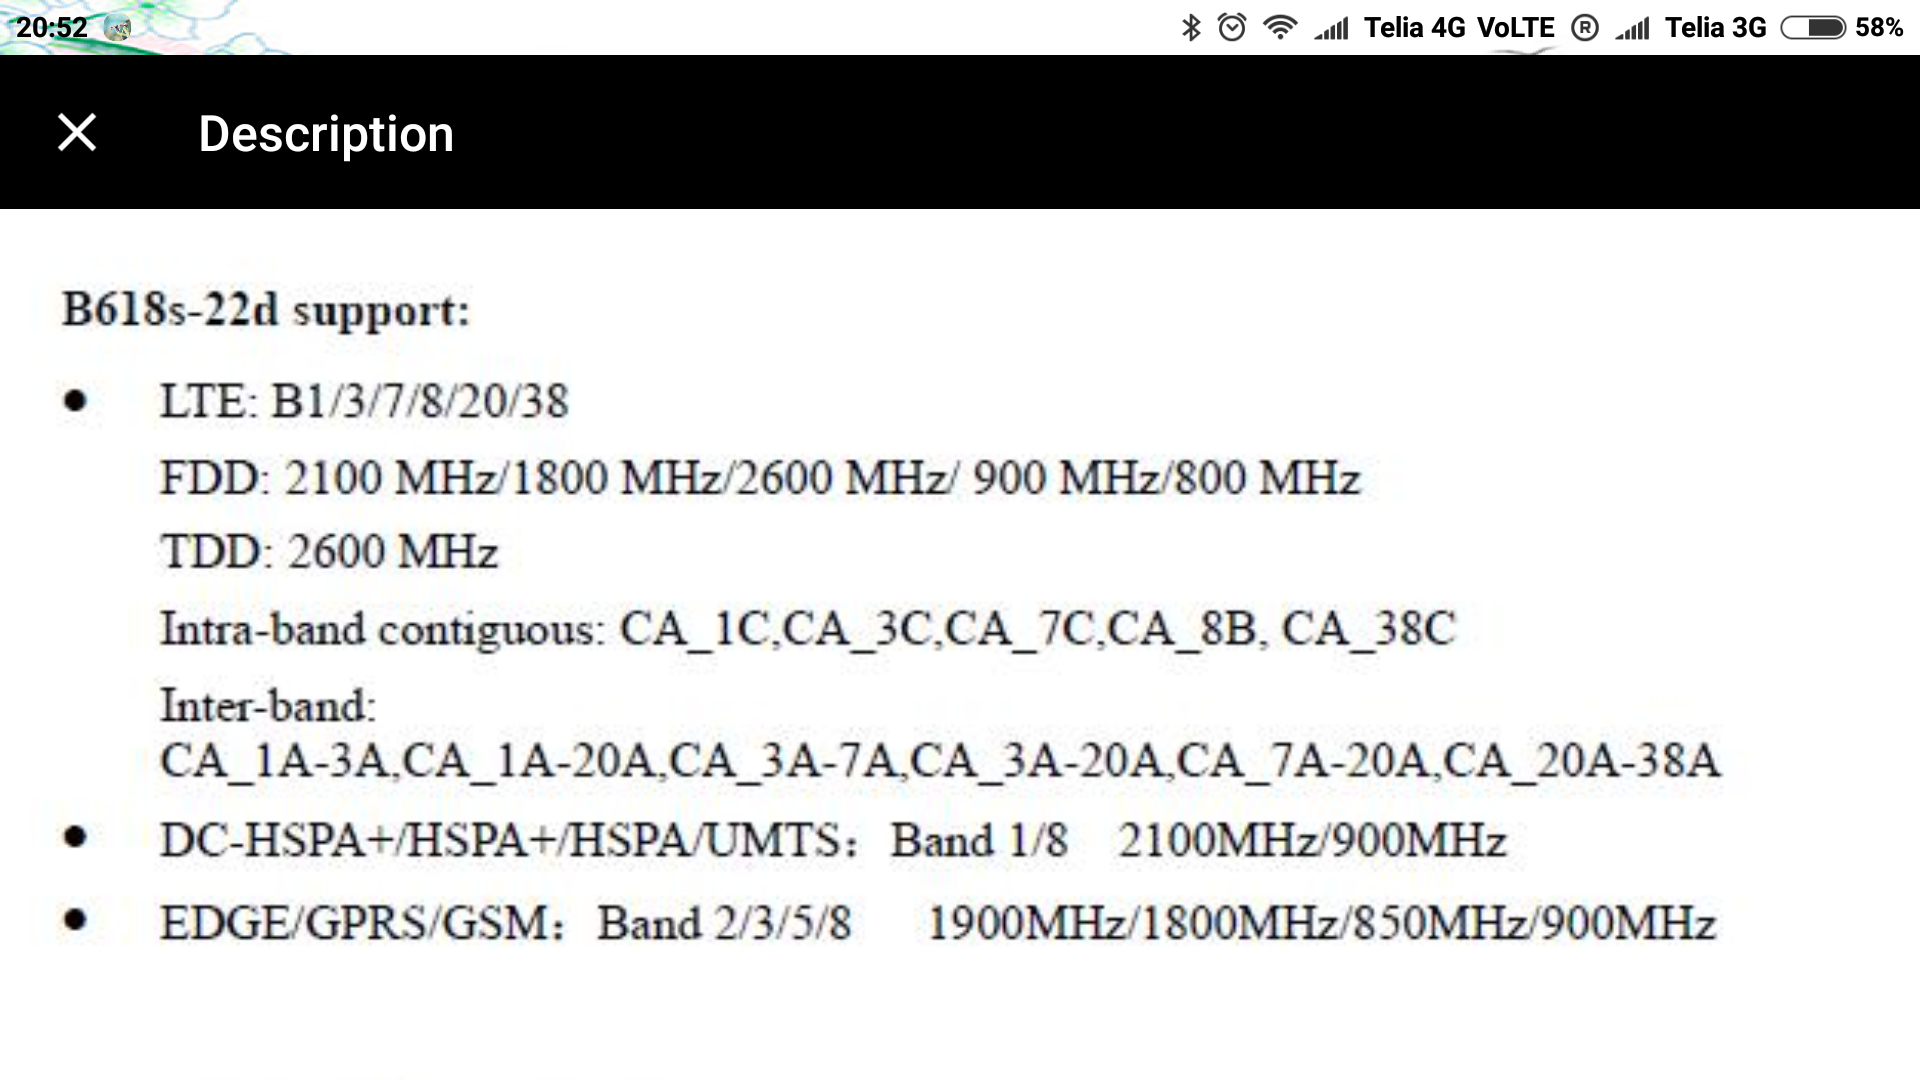 Screenshot_2017-10-16-20-52-04-680_com.alibaba.aliexpresshd.png